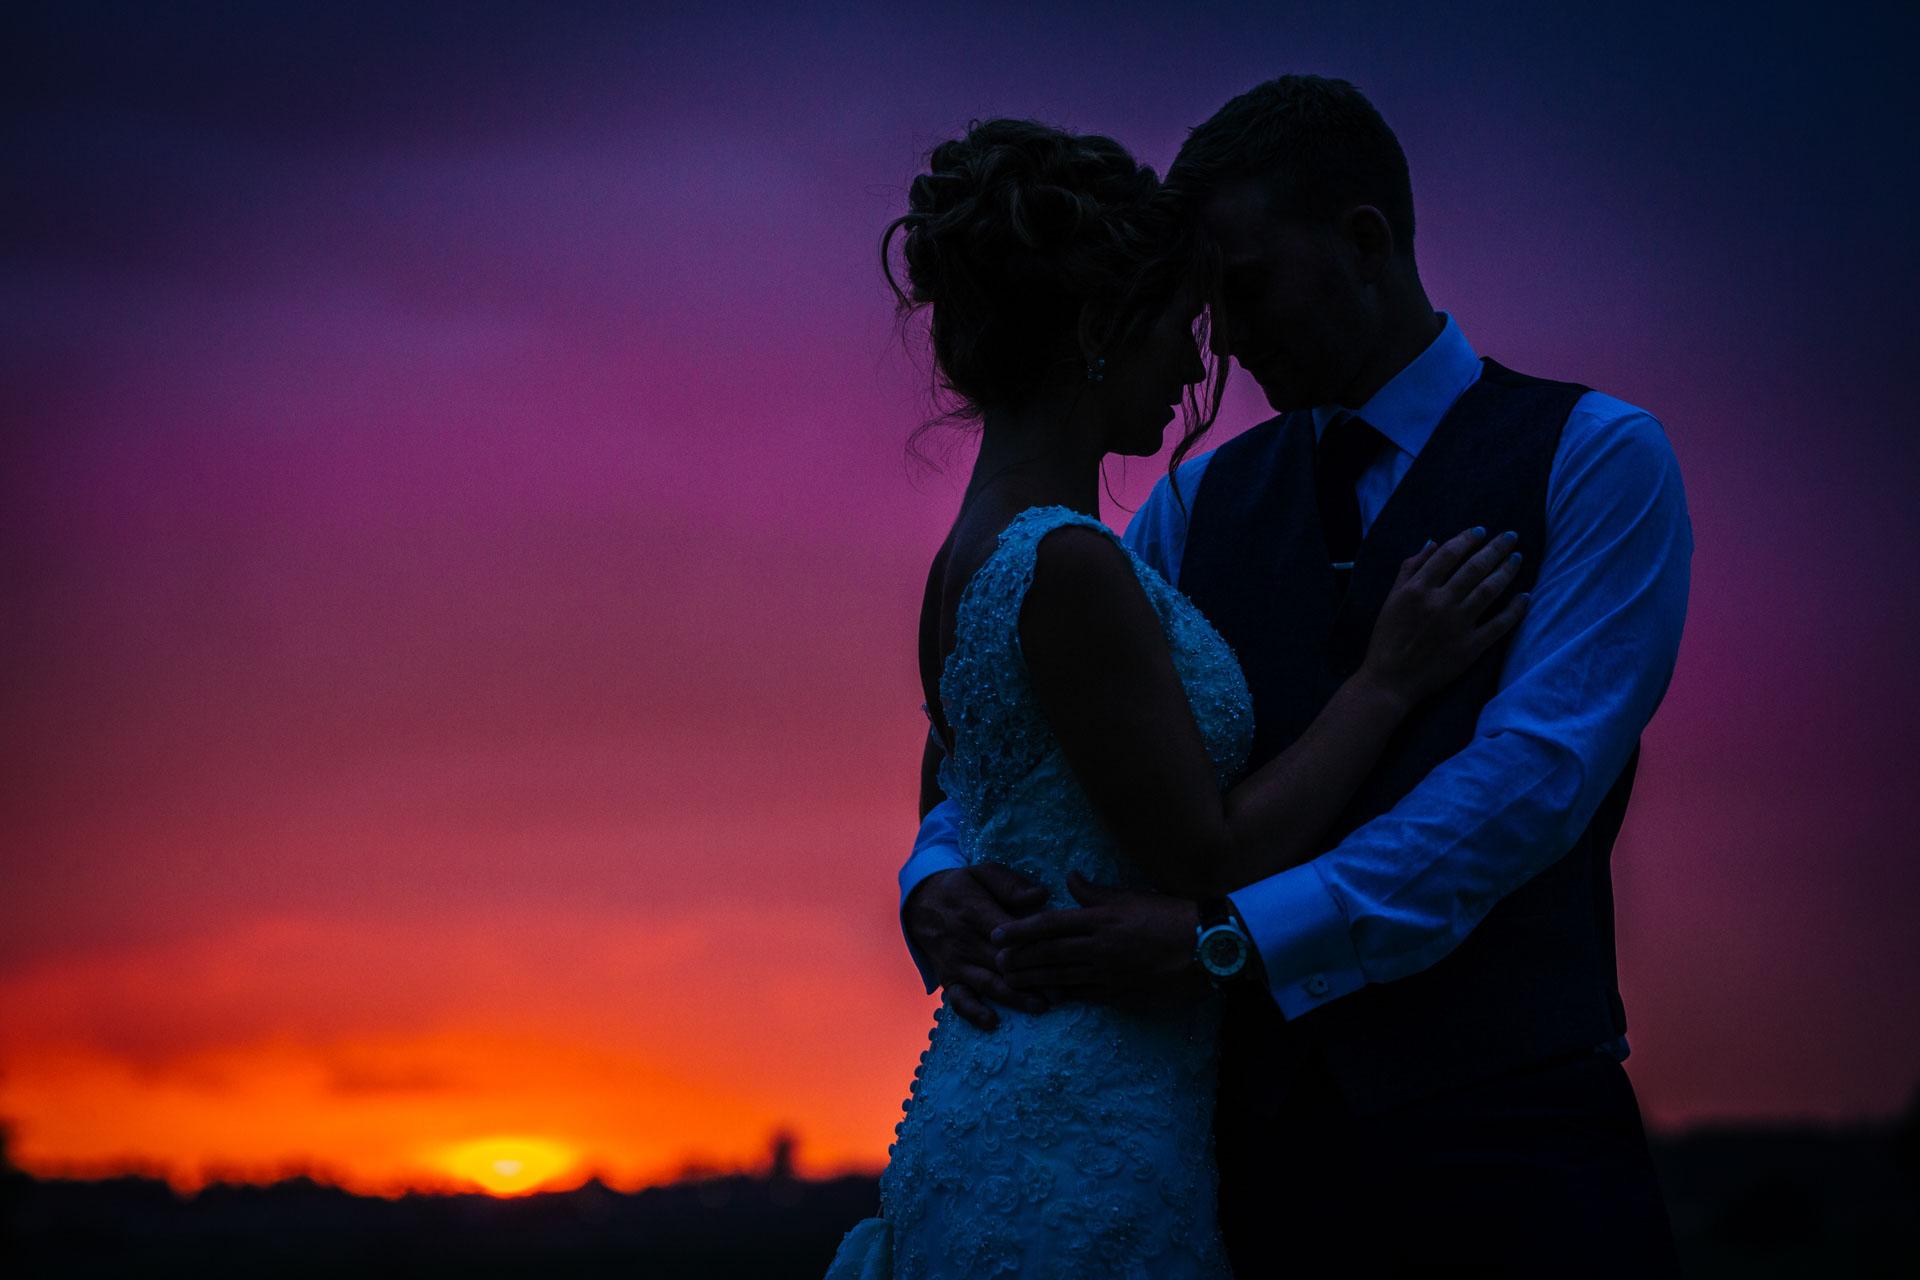 Tim & Laura's Sunset - Joanna Eardley Photography